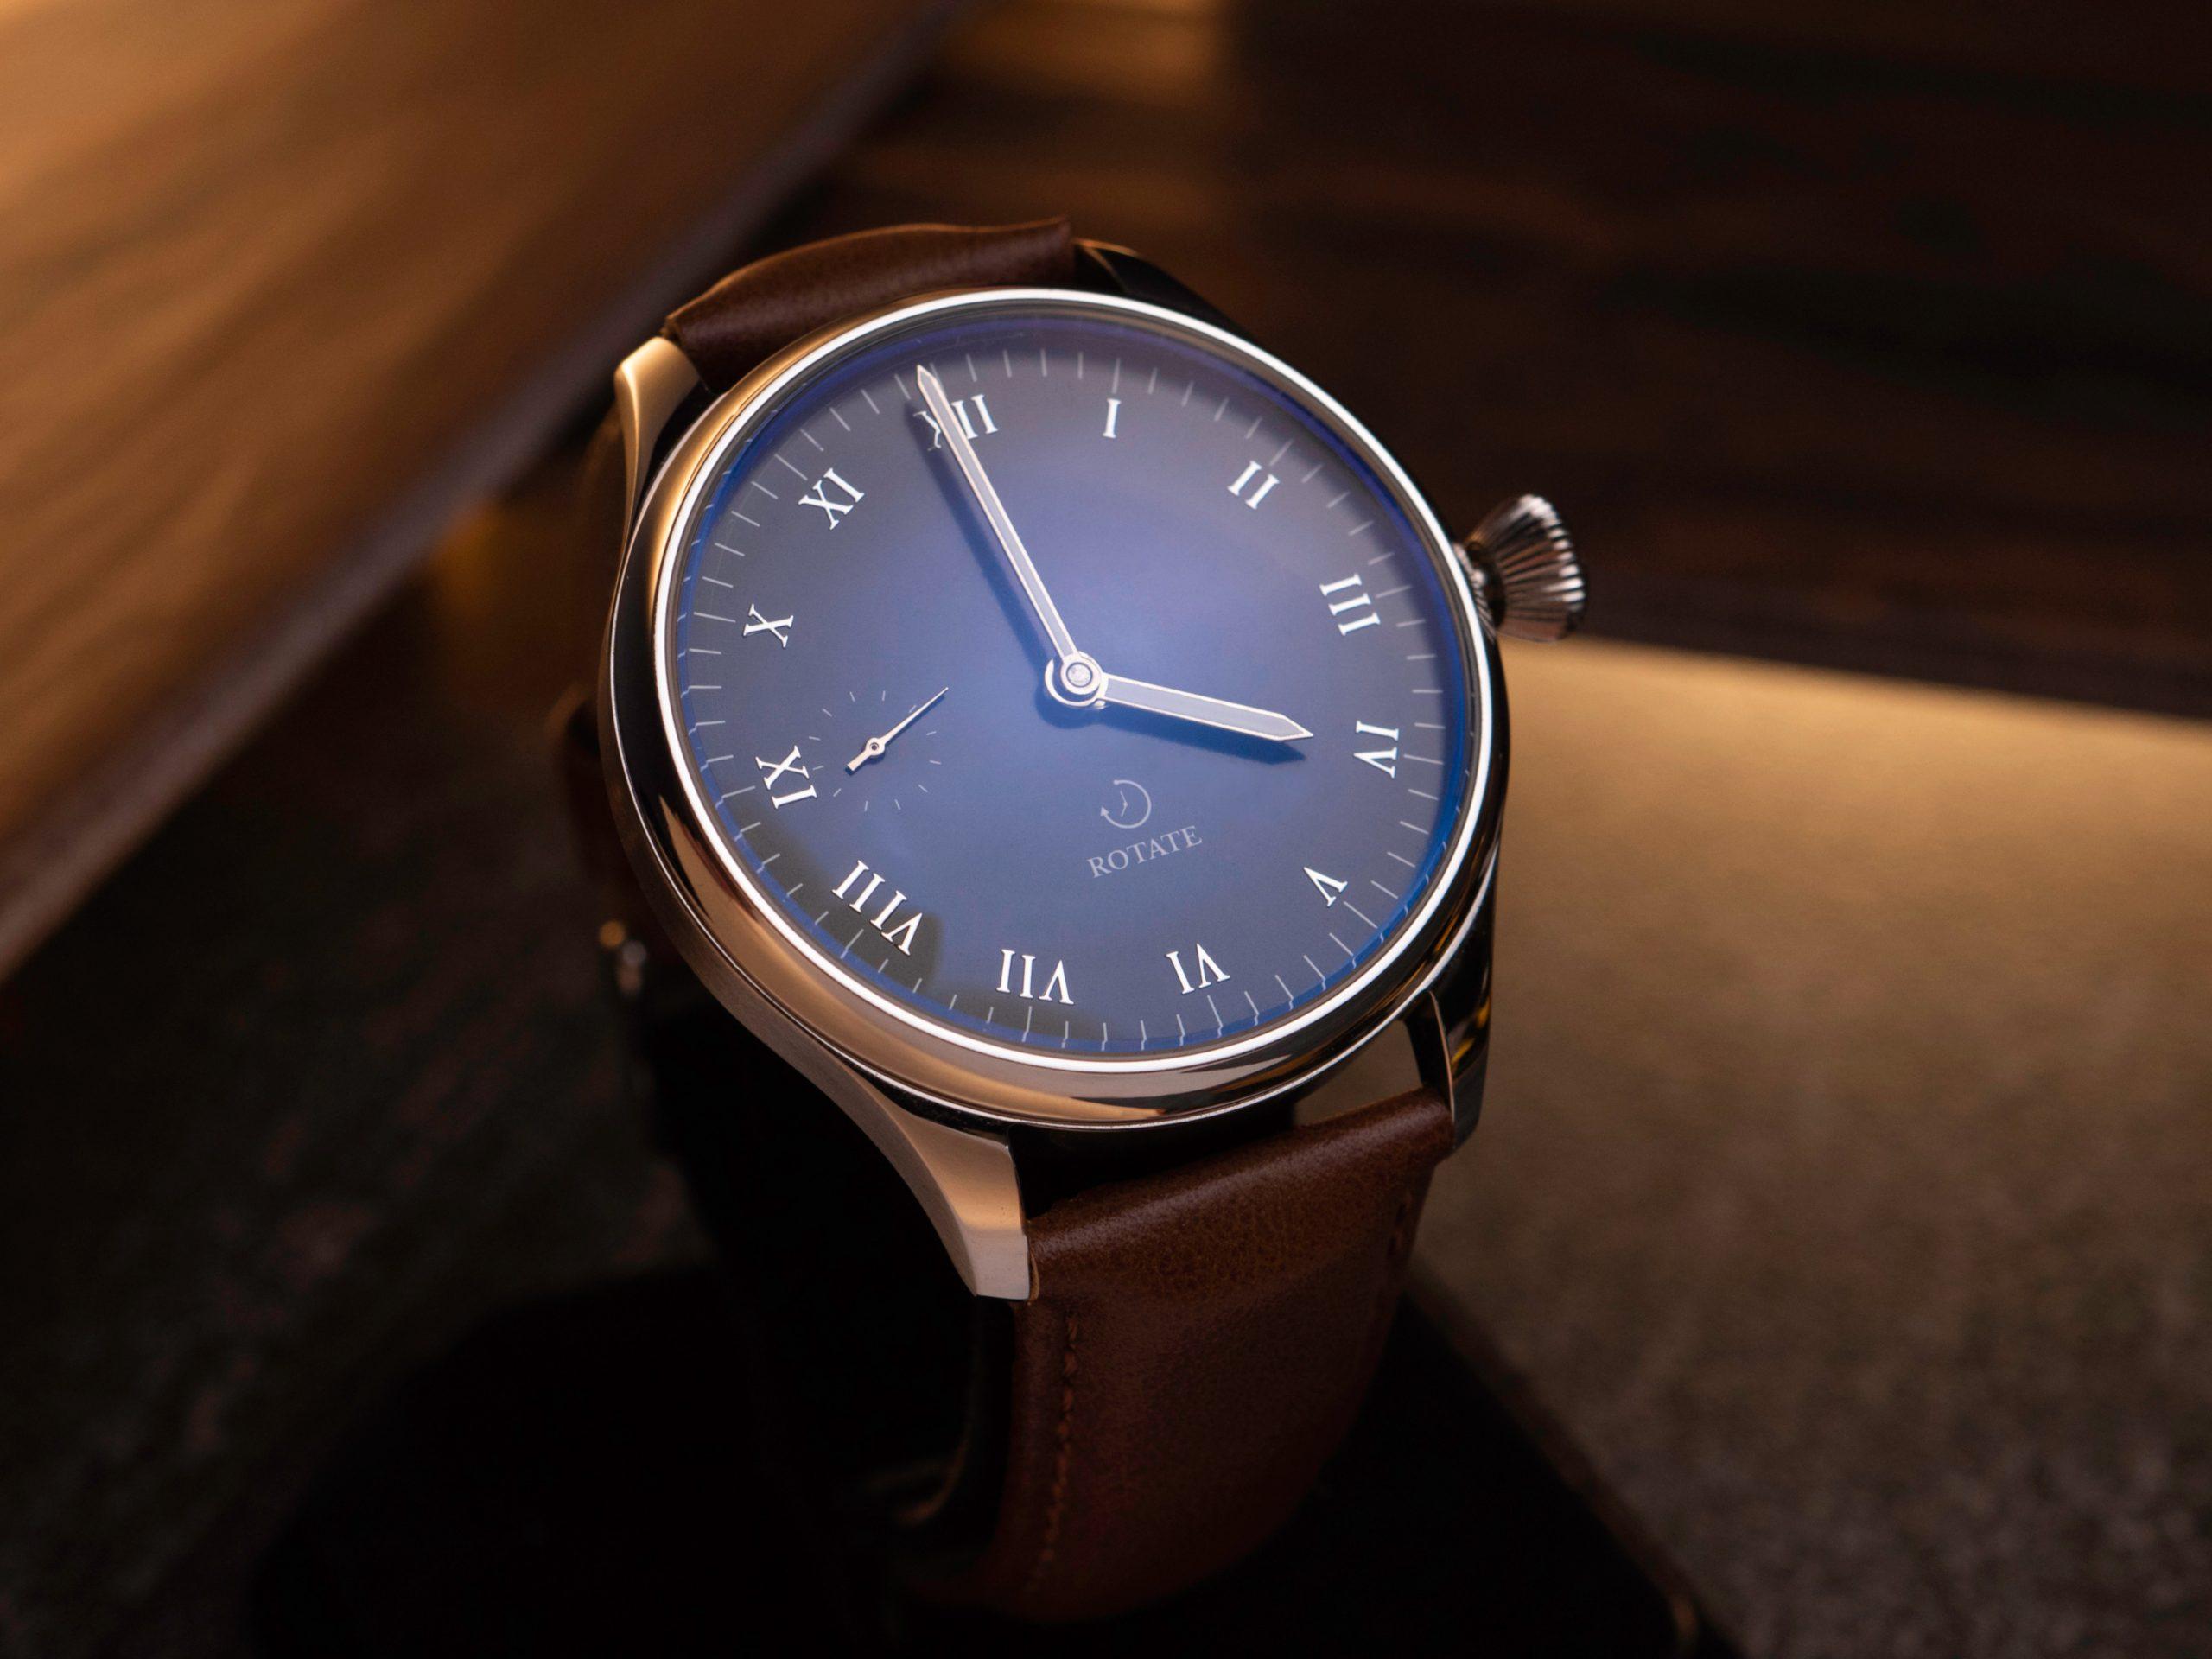 Trustworthy Watches